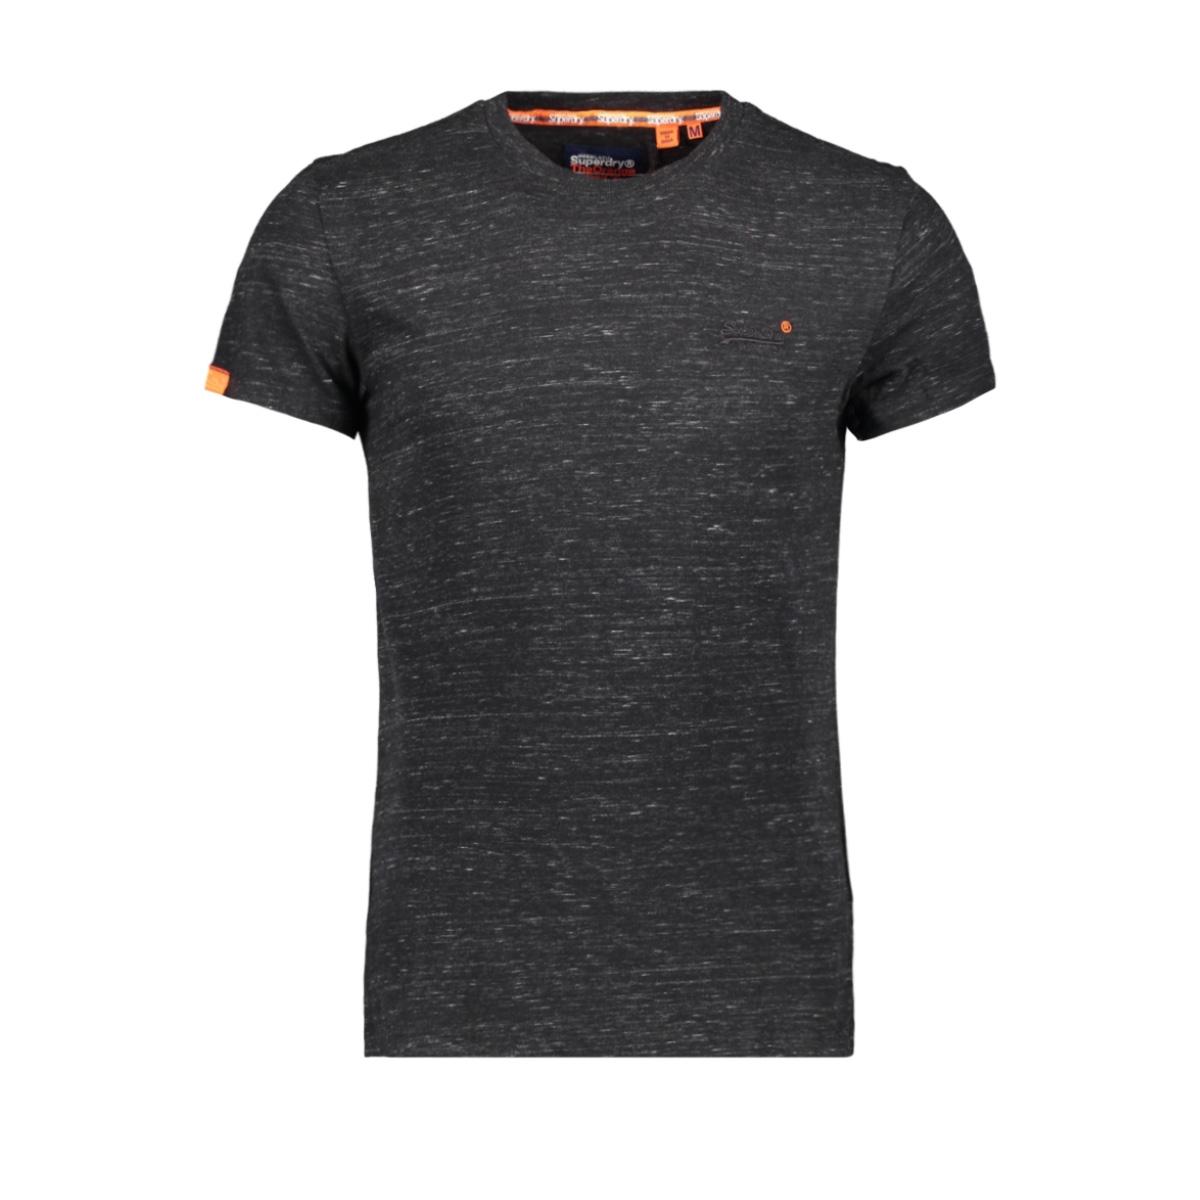 ol vintage embroidery tee m1000020a superdry t-shirt vast black space dye